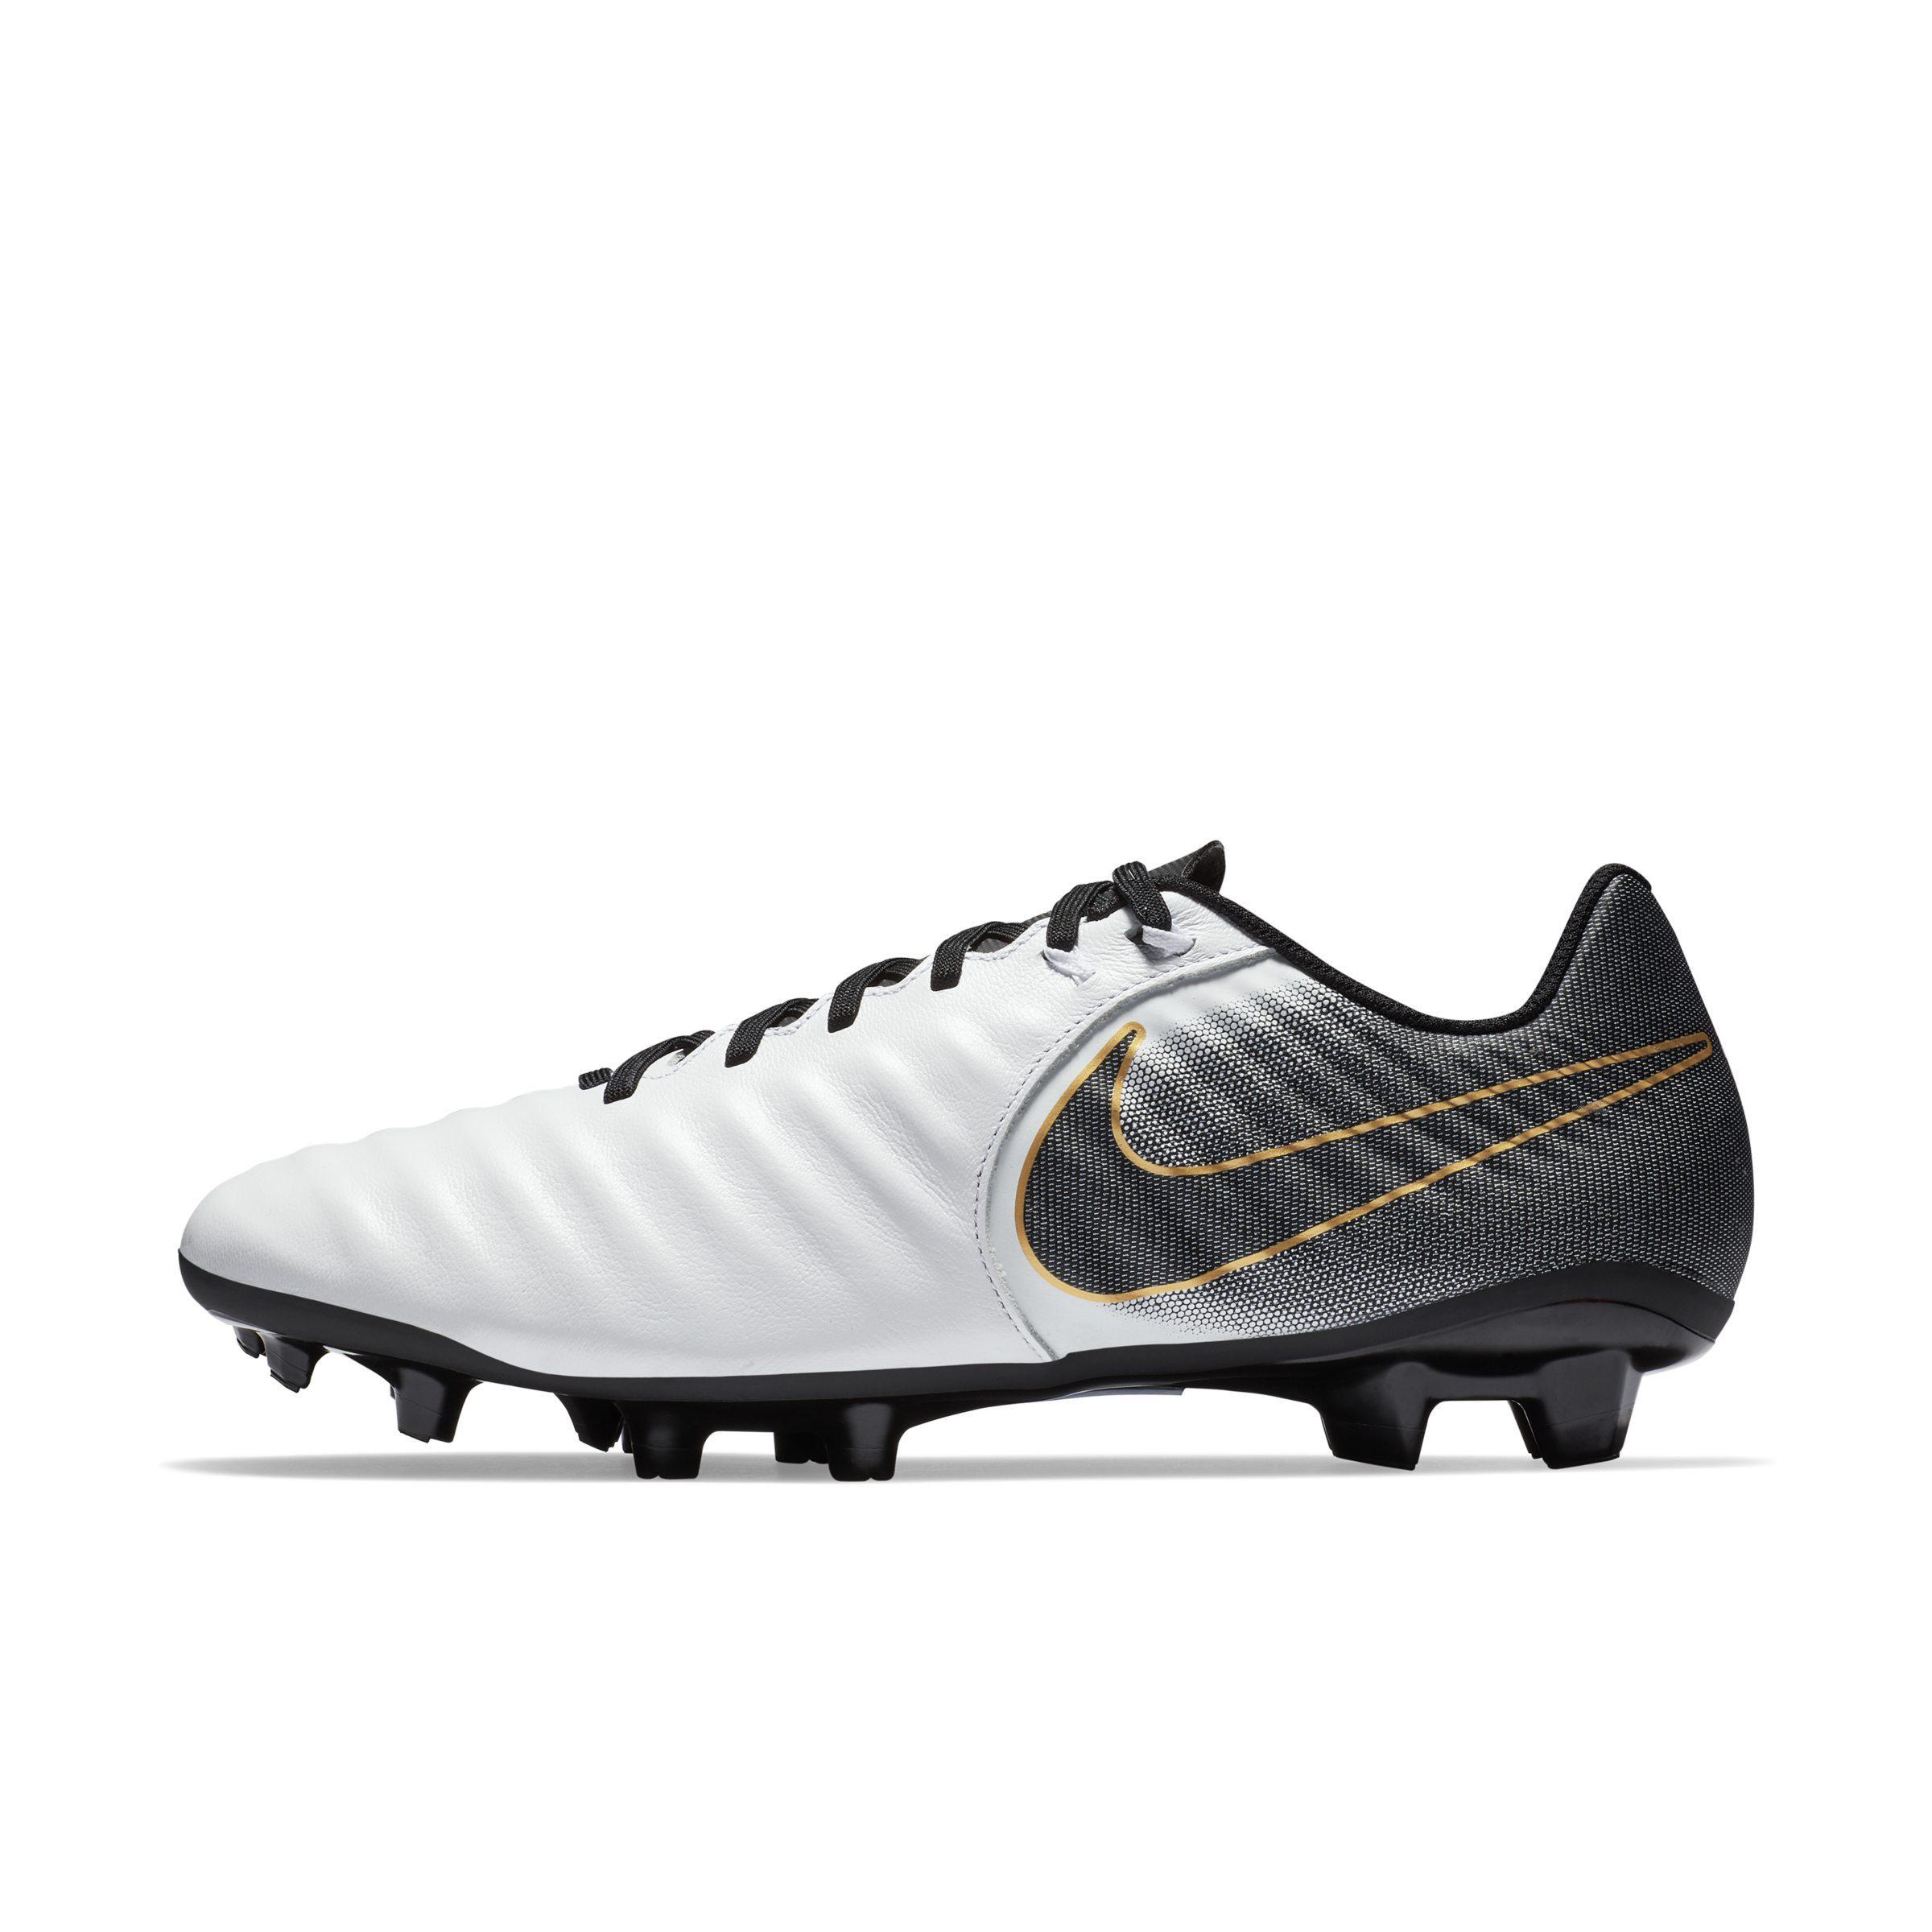 Nike Tiempo Legend Vii Academy Firm-ground Football Boot in White - Lyst 83ddf0267